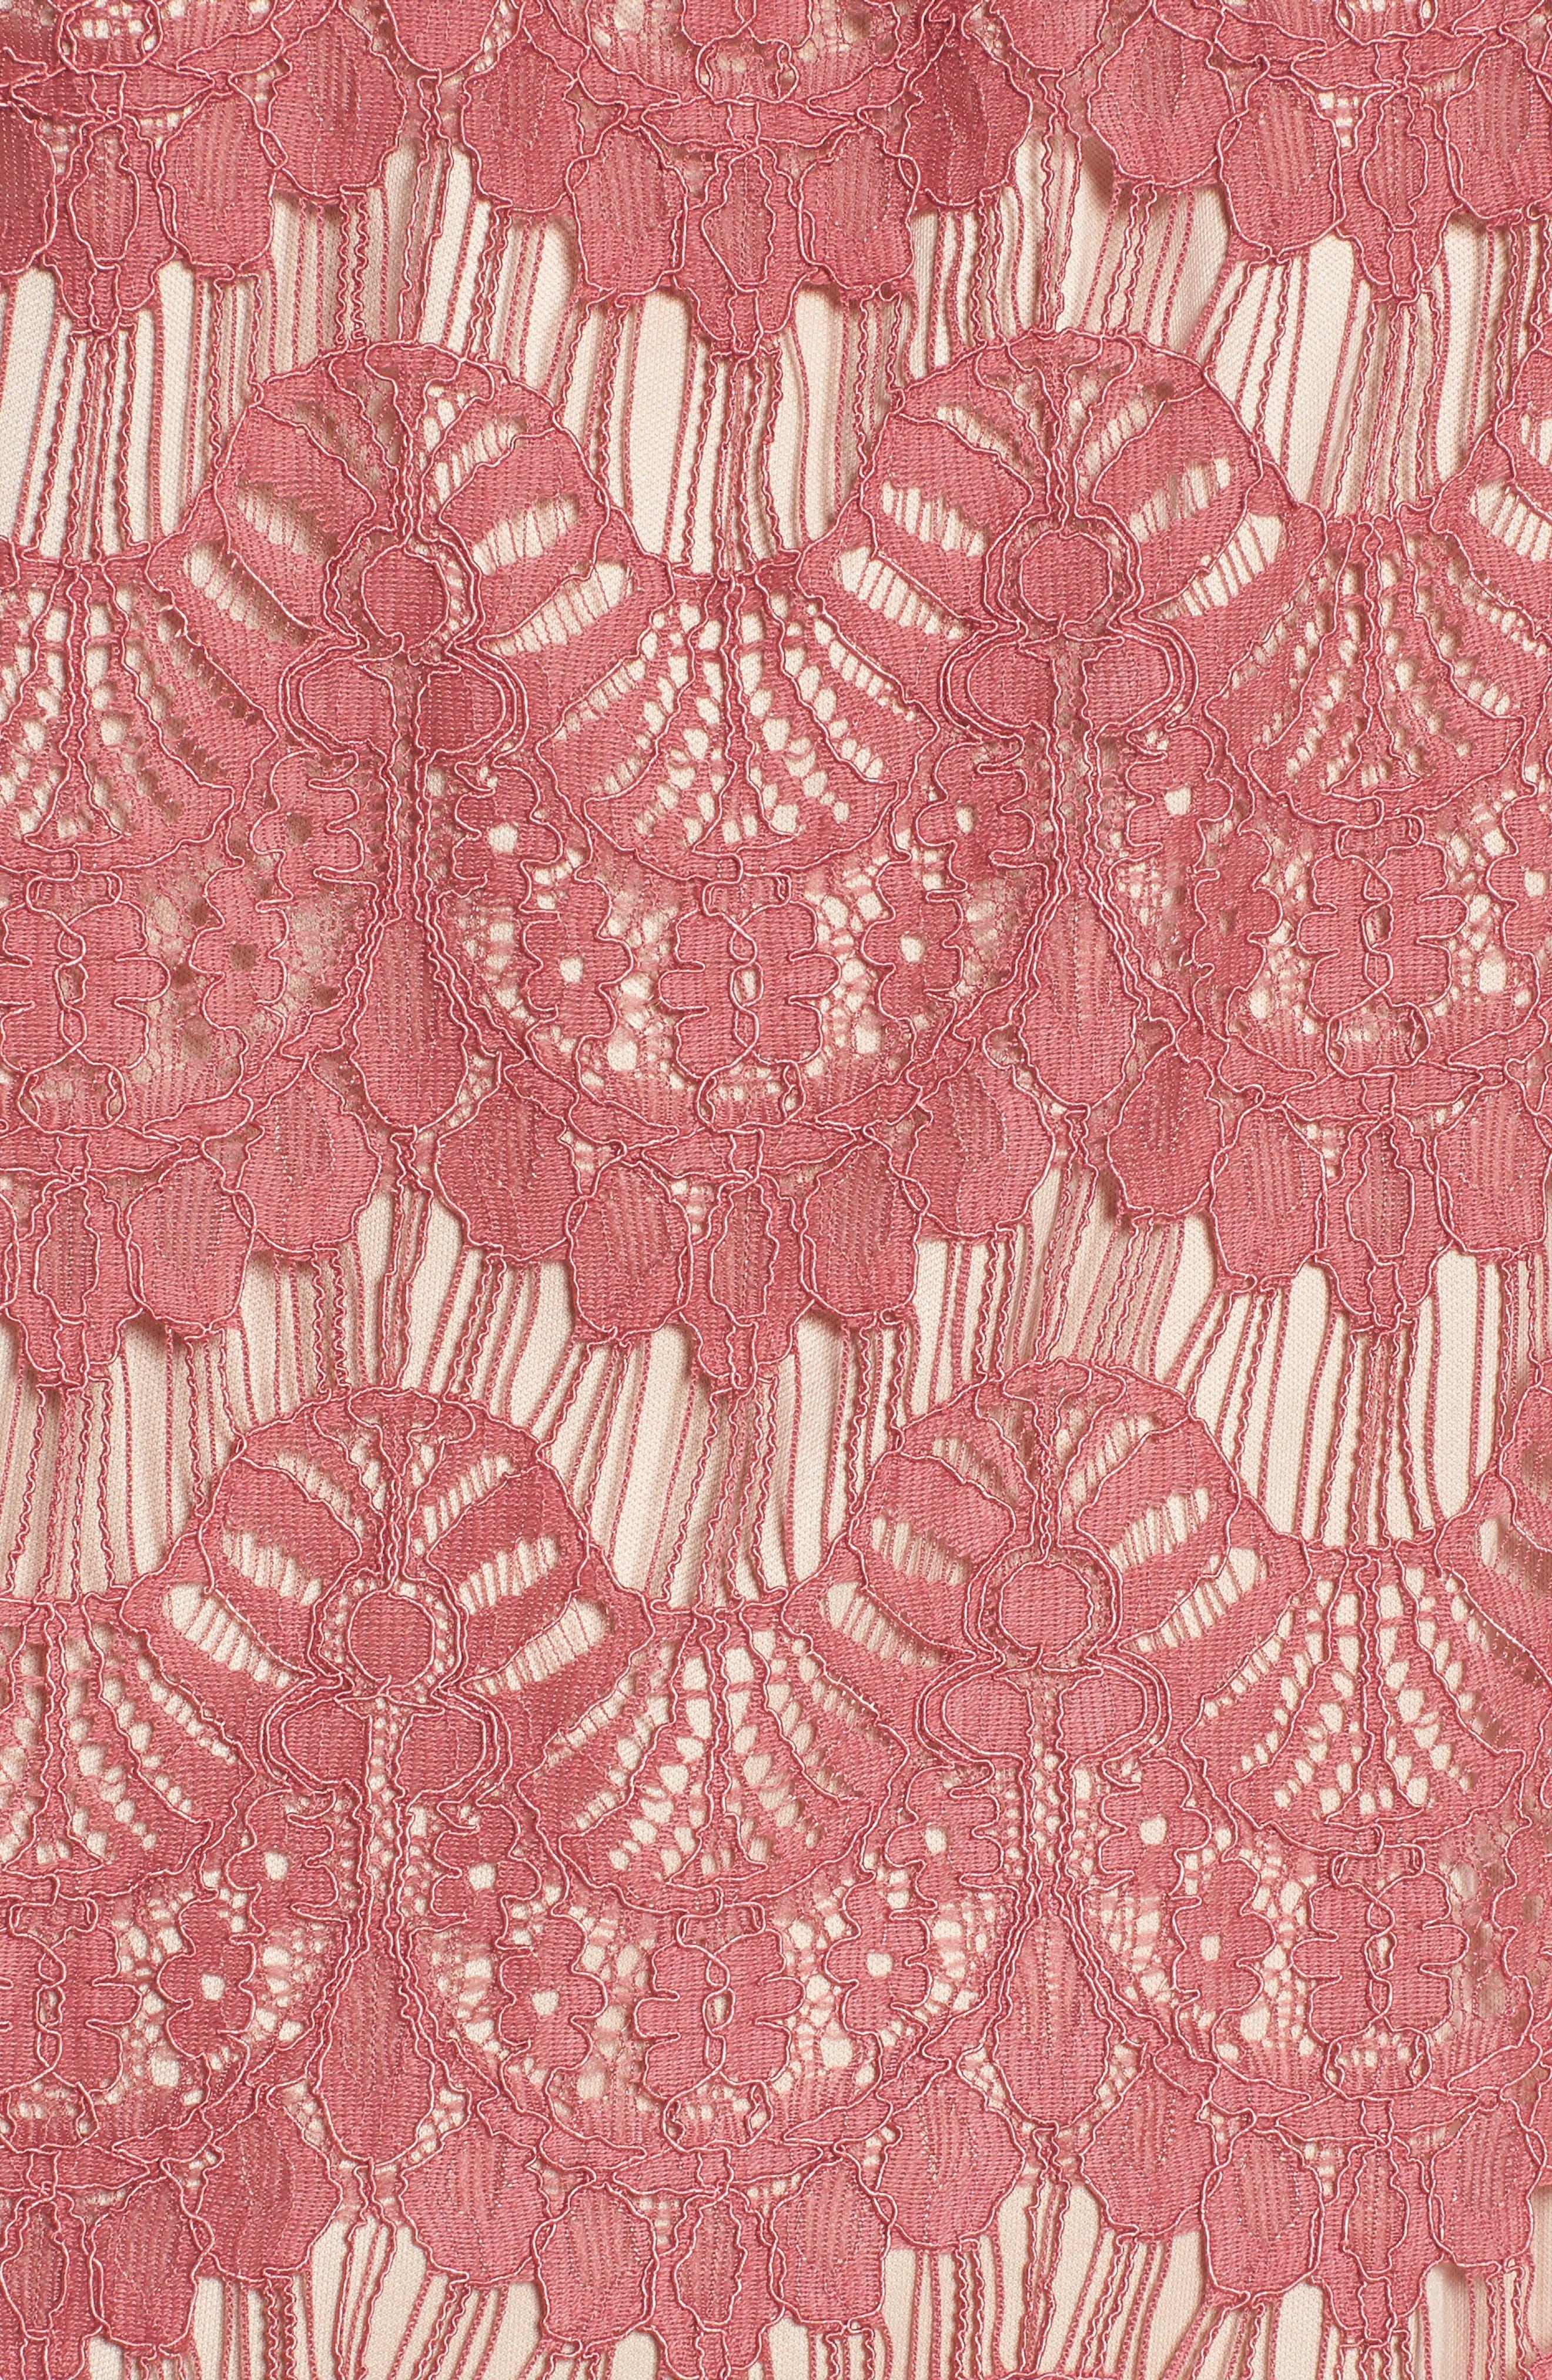 Lace Shift Dress,                             Alternate thumbnail 5, color,                             Mauve/ Nude